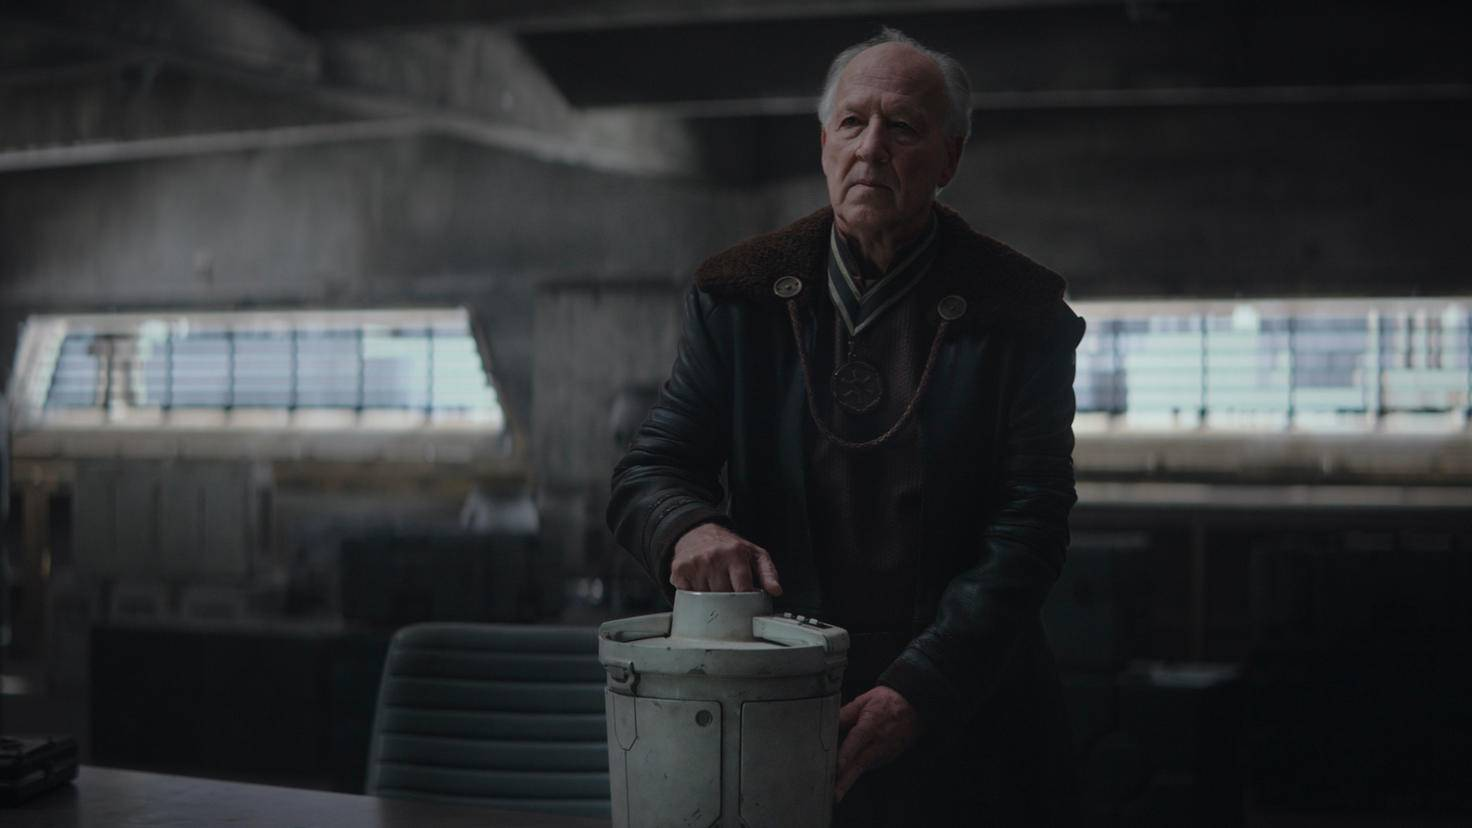 The Mandalorian Werner Herzog Klient S01E03